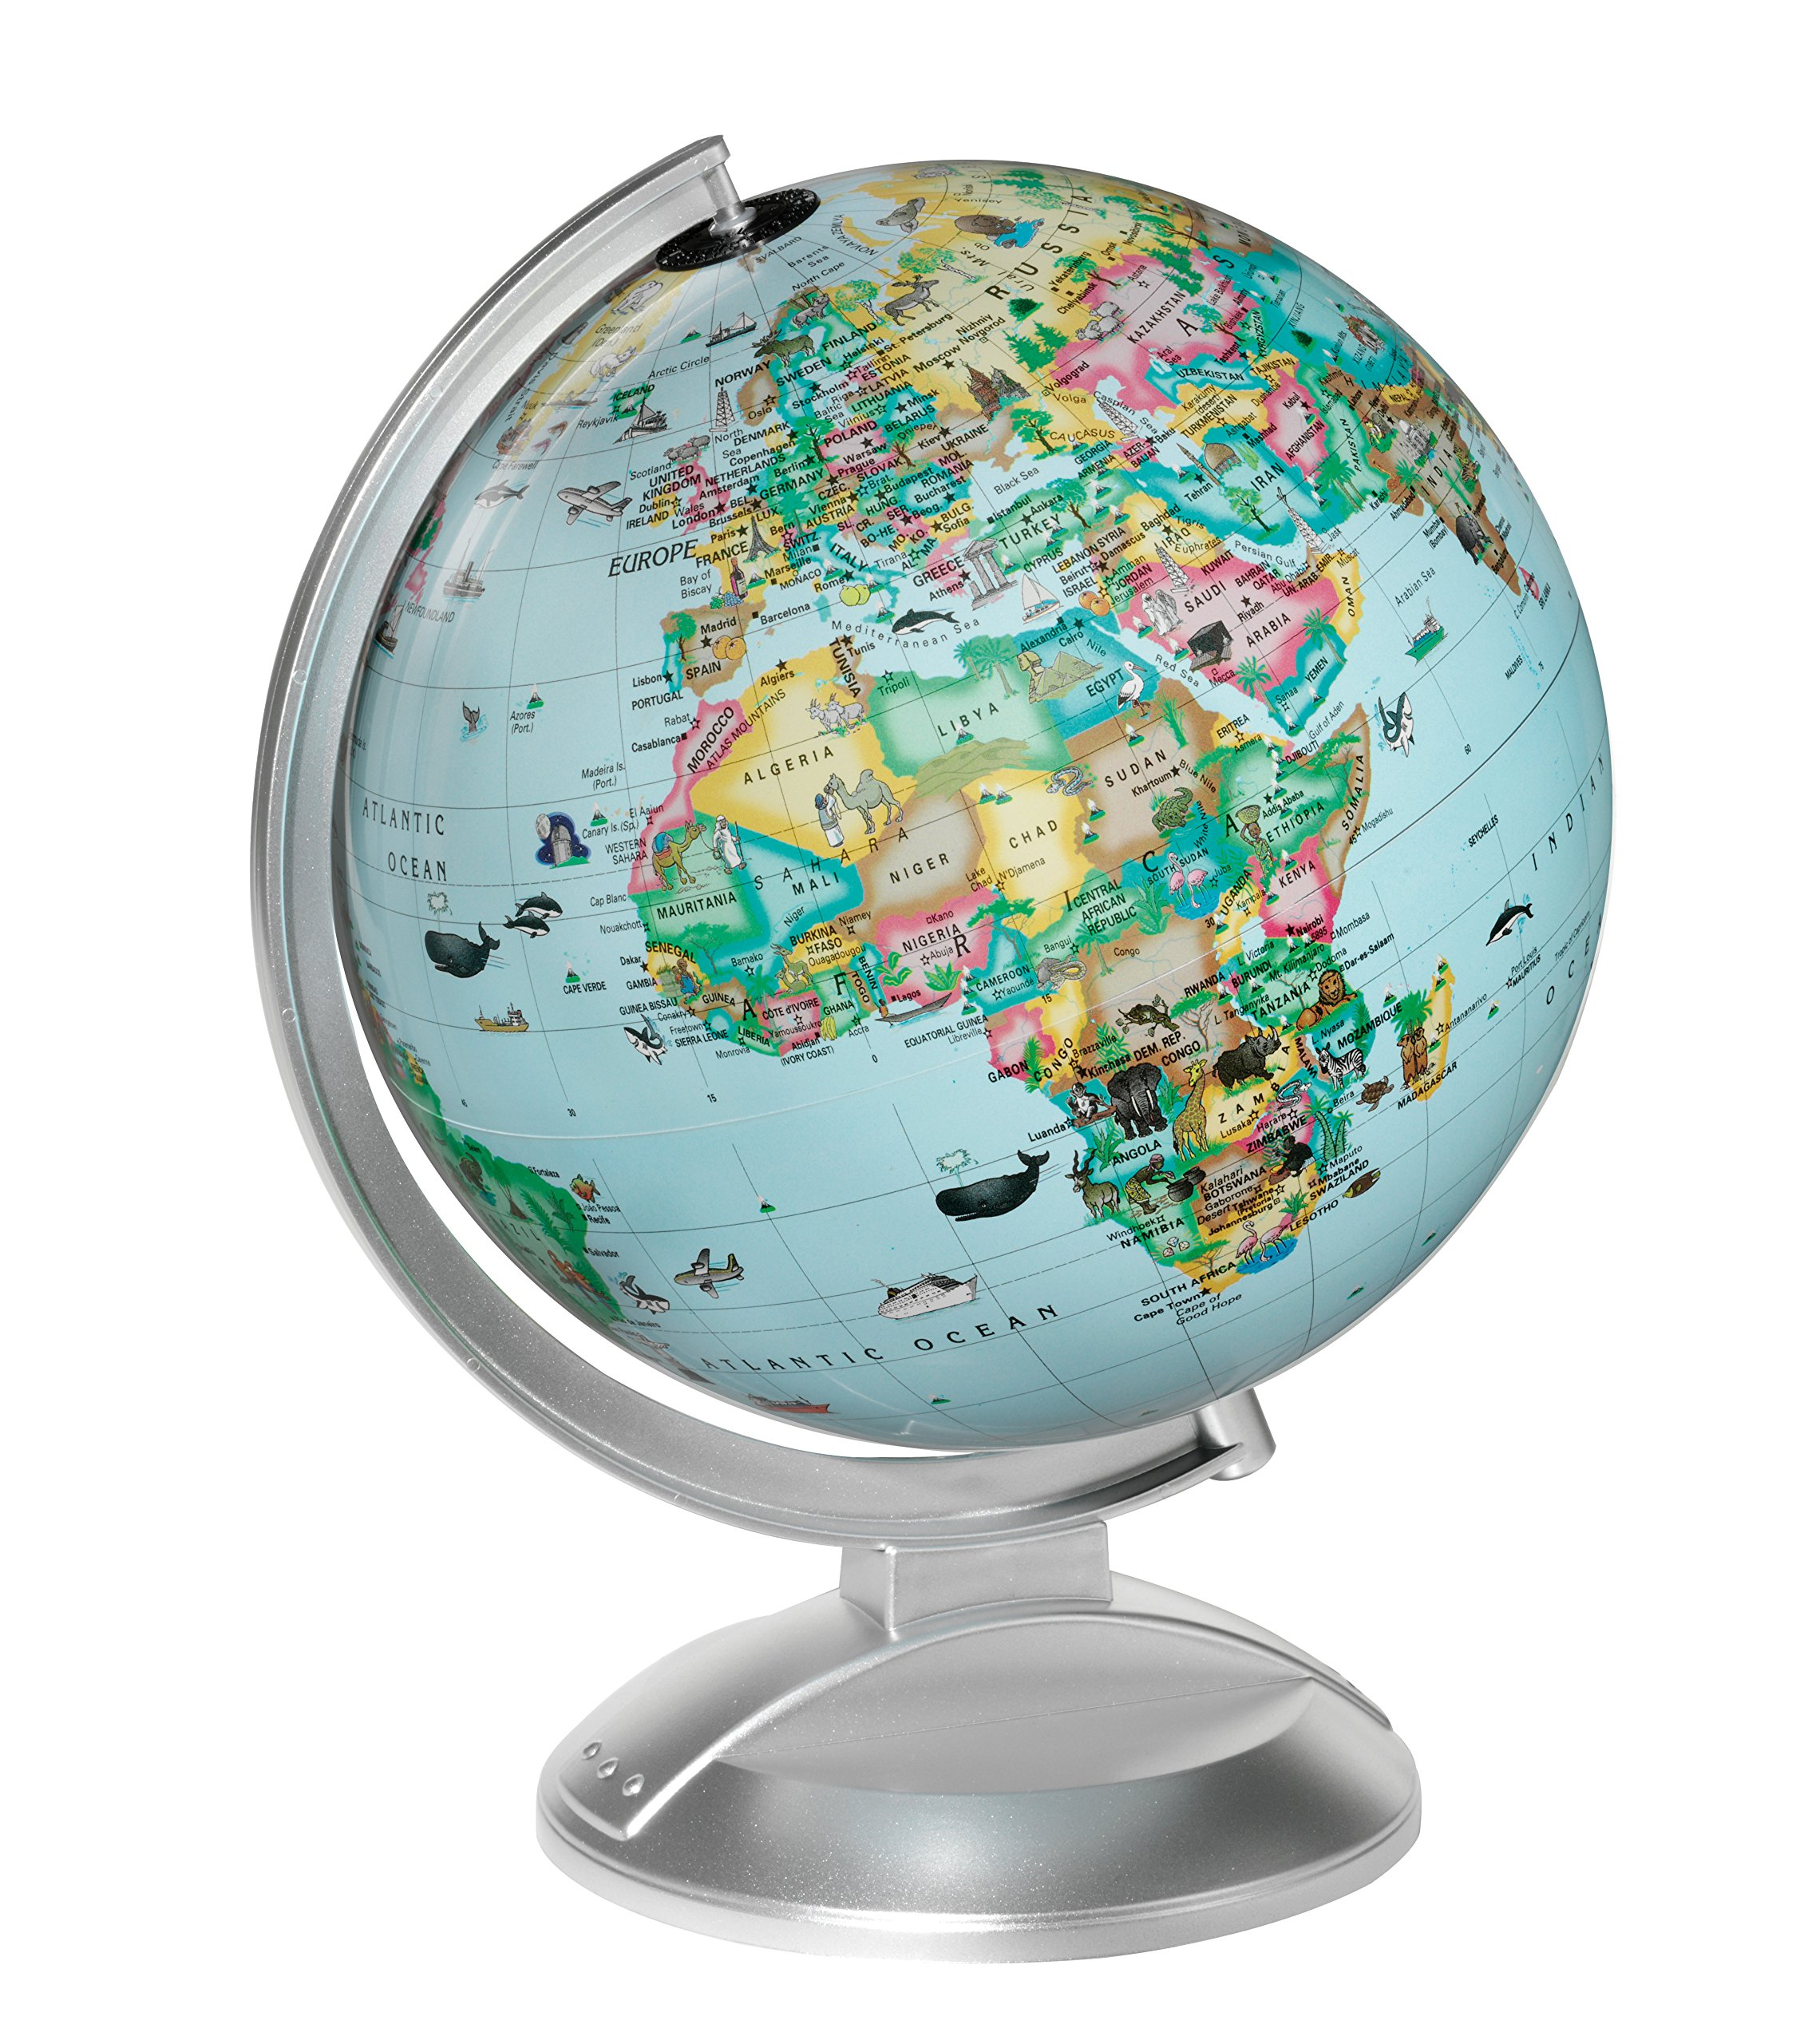 Replogle Illuminated Blue Ocean Globe 4 Kids, Kid Friendly Political Map, Dual Map, Educational Toy